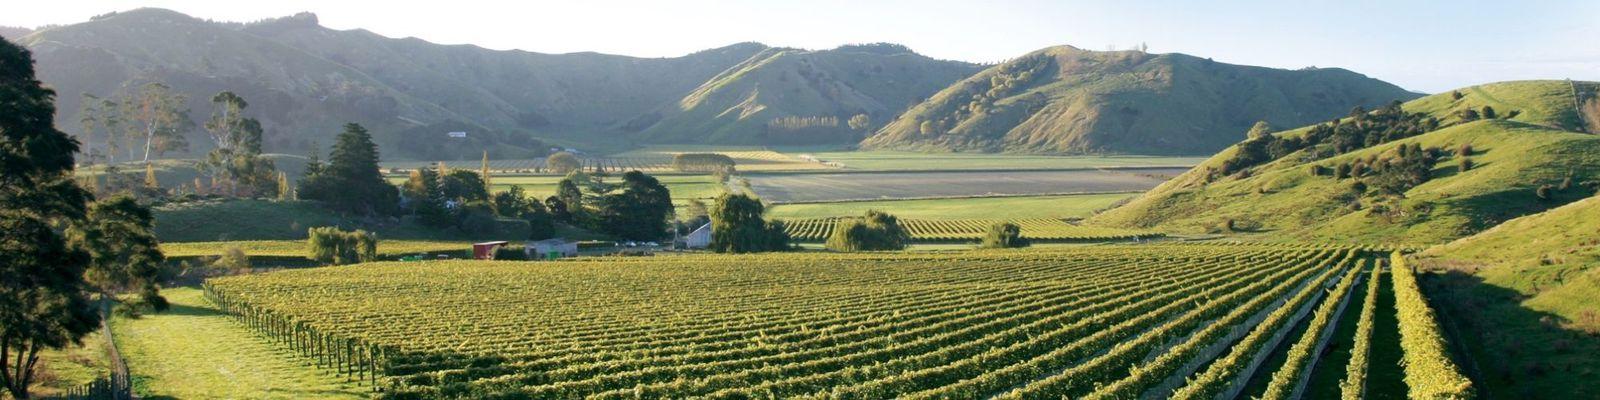 Gisborne Wine Region